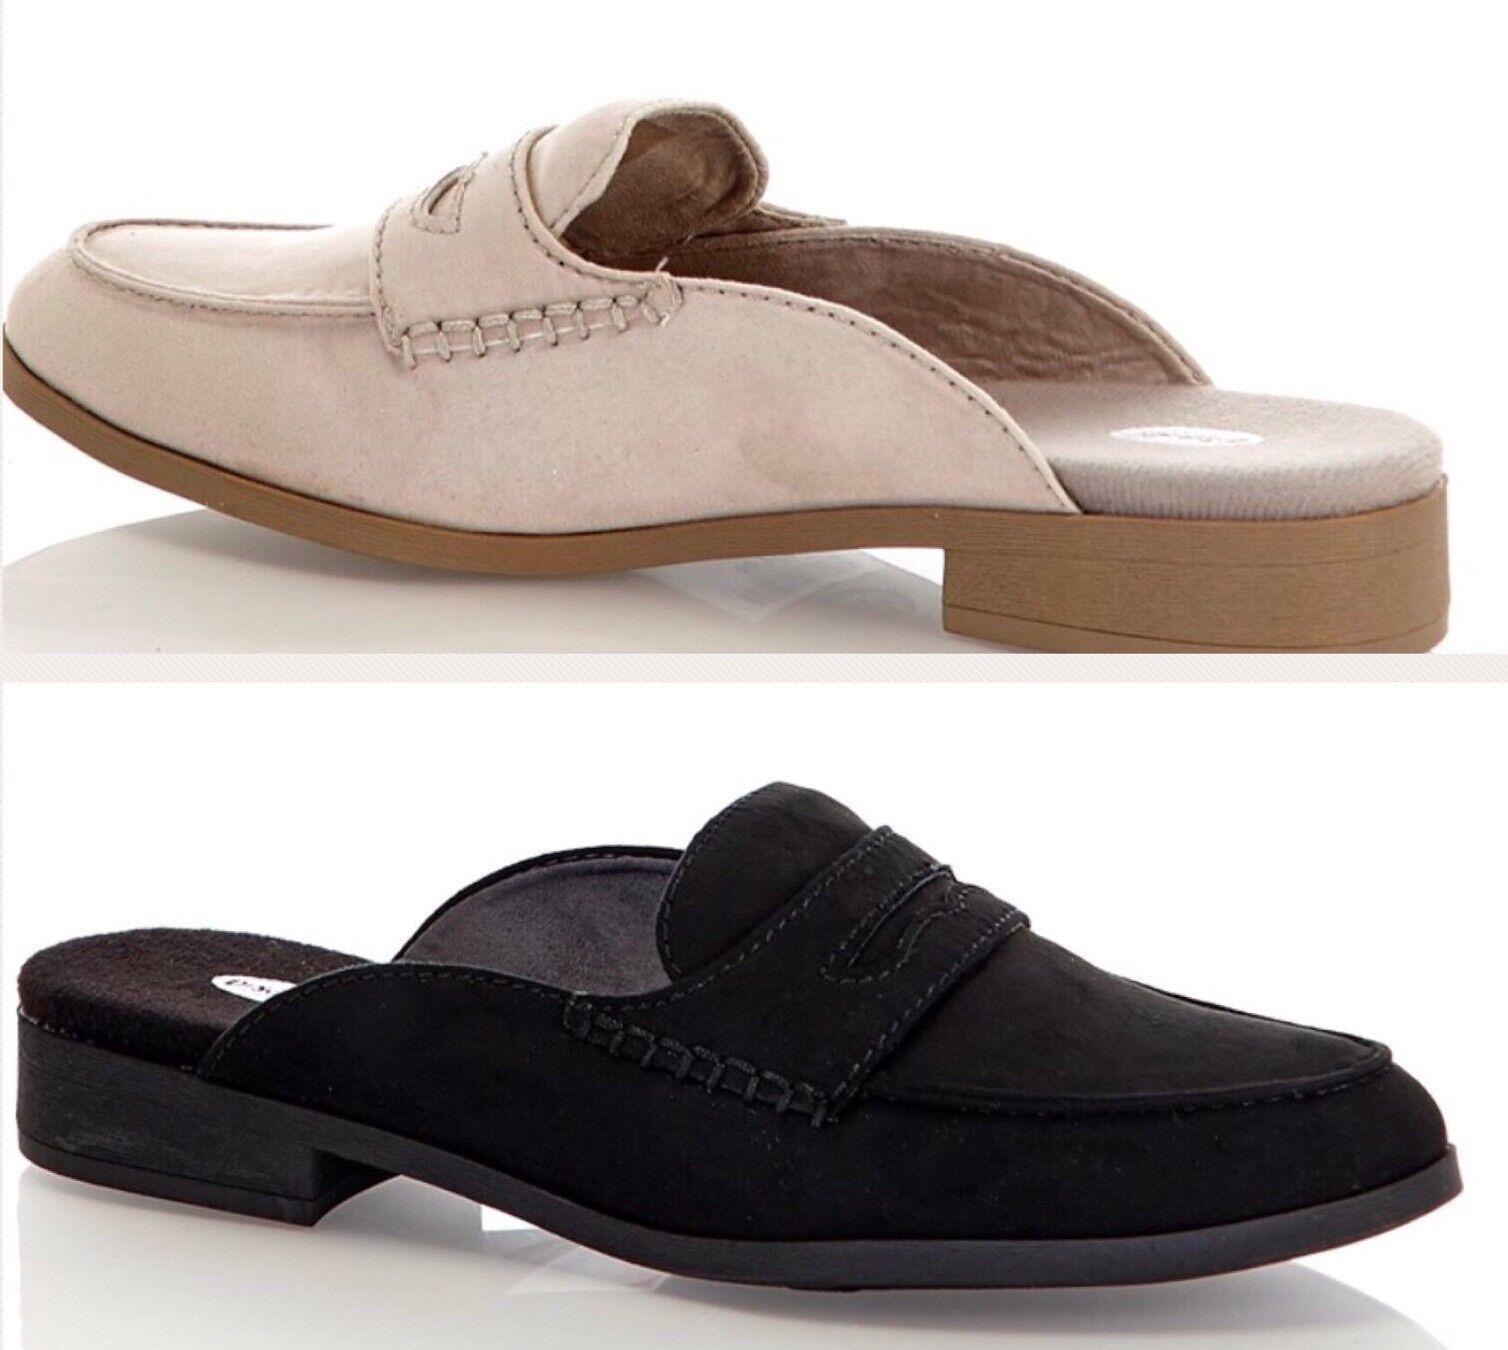 Dr Scholls Tailored Mules Beige Shoes Clogs Slides Black Beige Mules Women 6 7 8 9 10 NEW bef00c